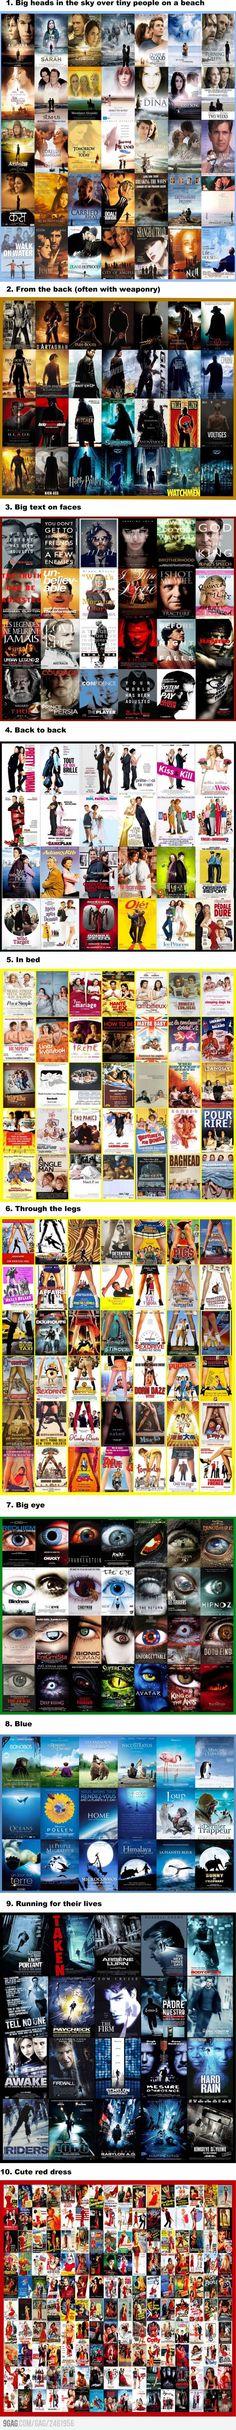 Imaginative movie posters :-)